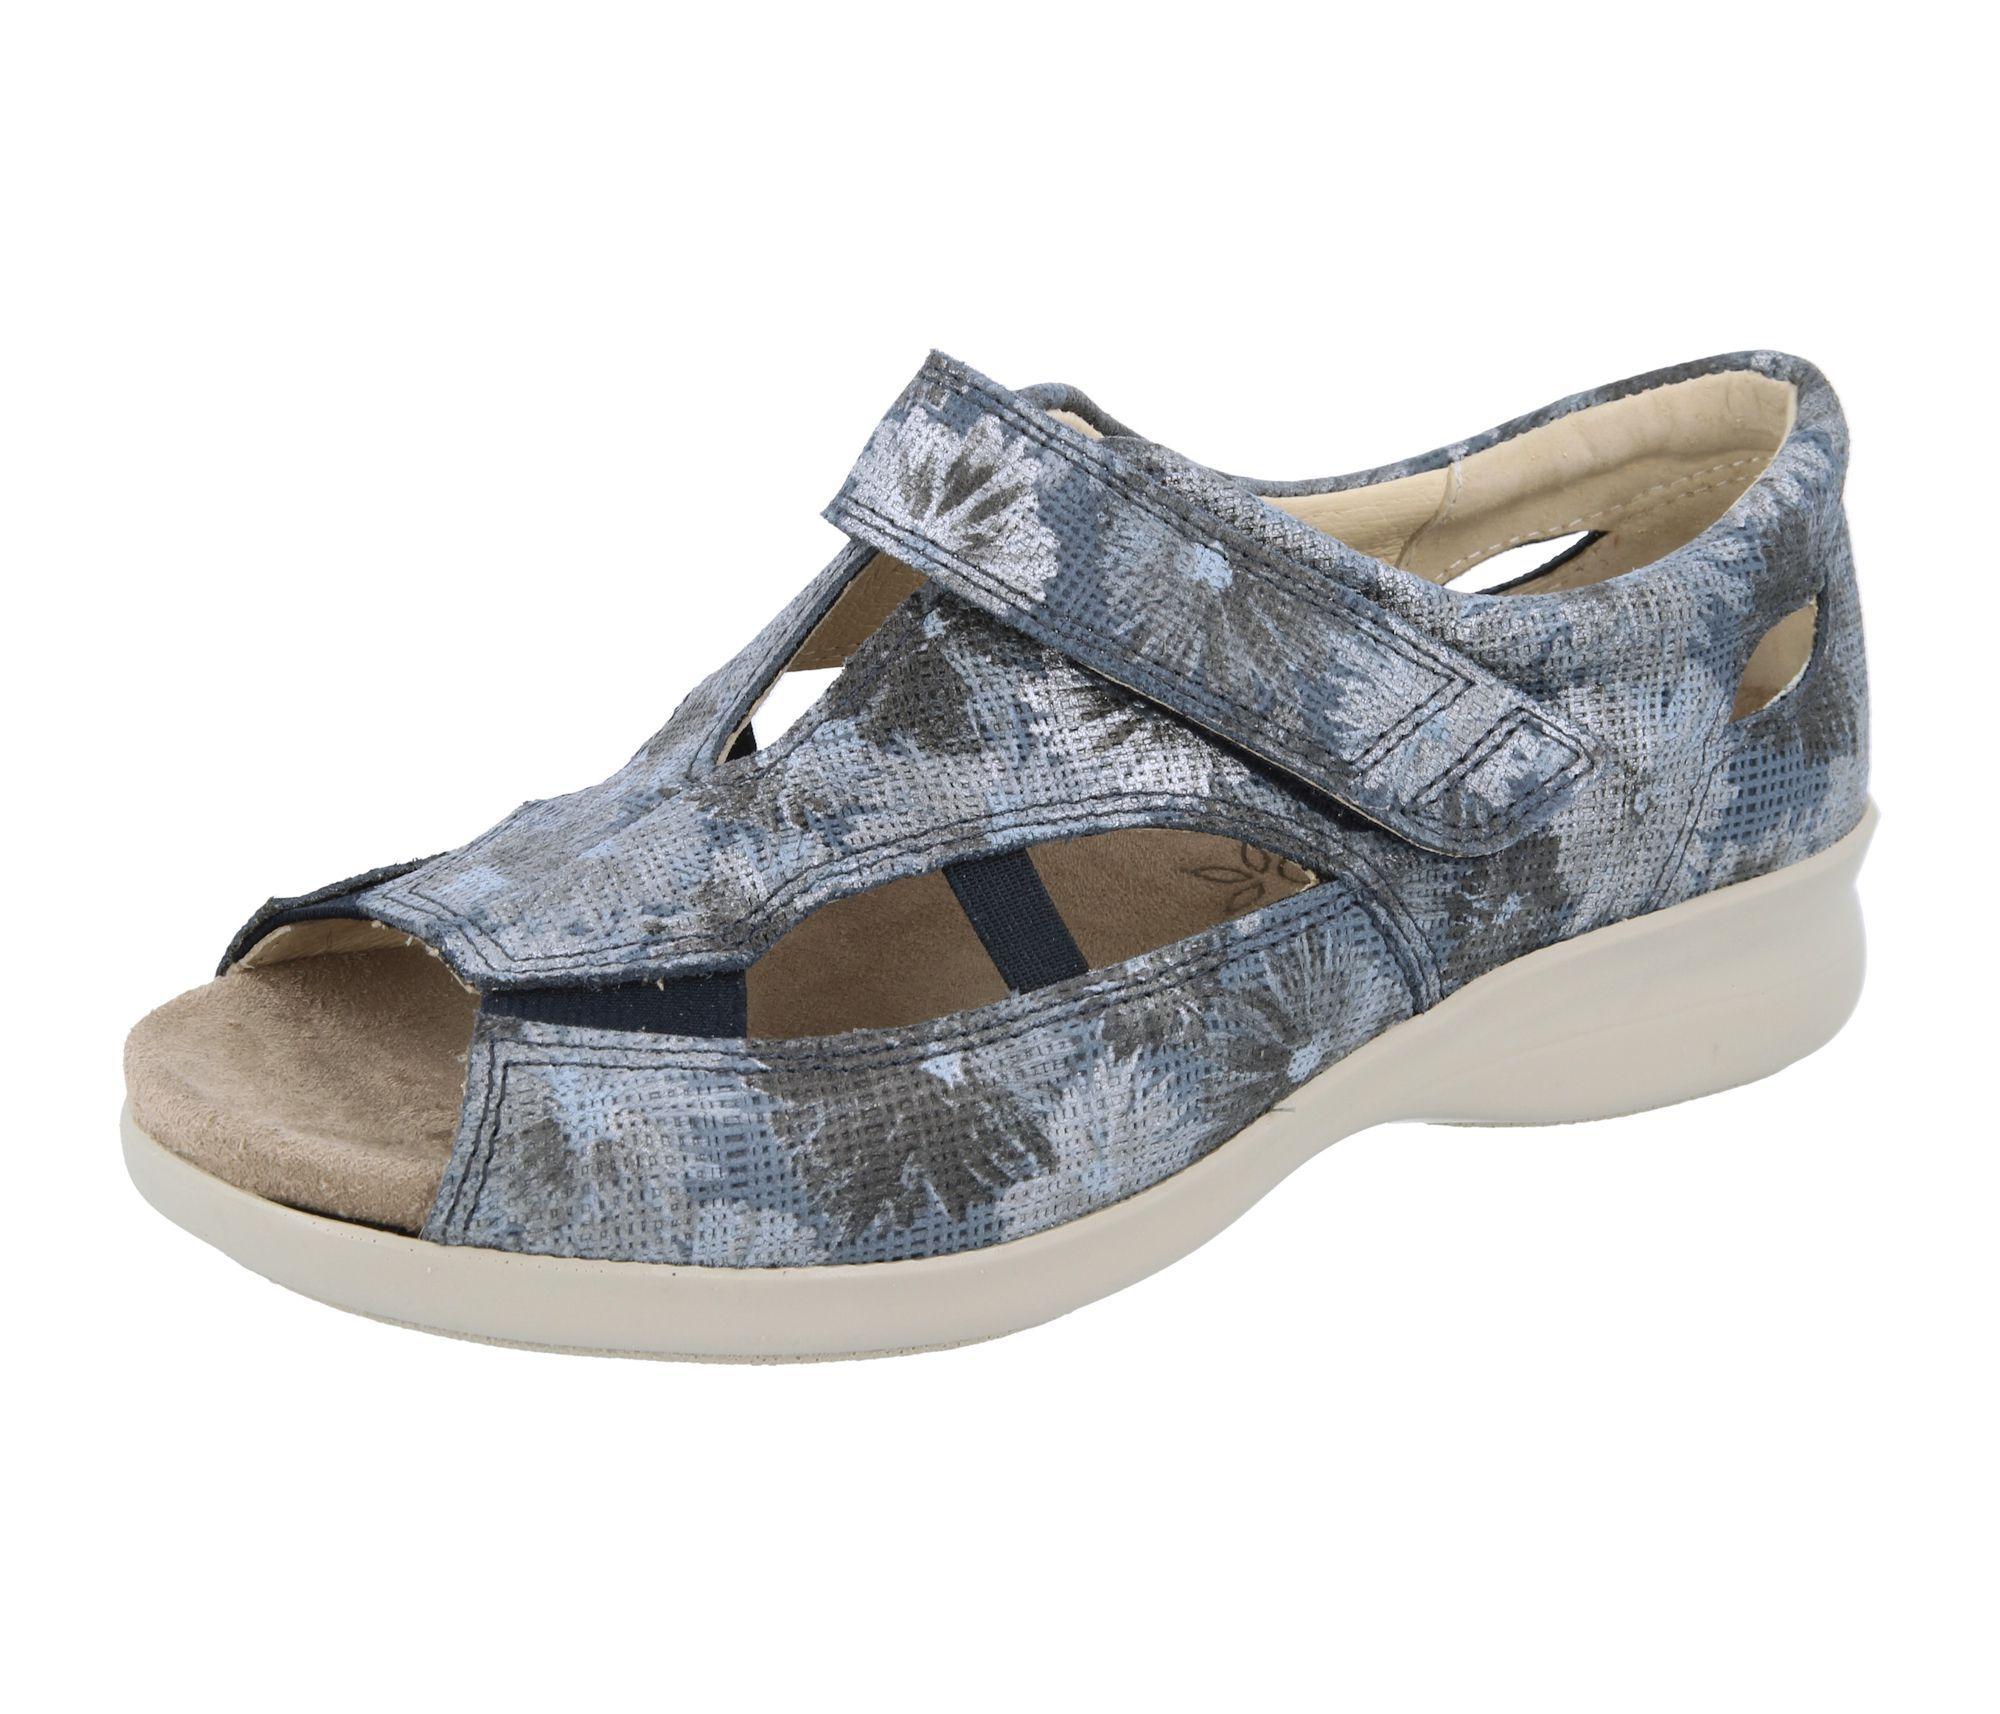 Db Wider Fit Acorn Sandals - Living